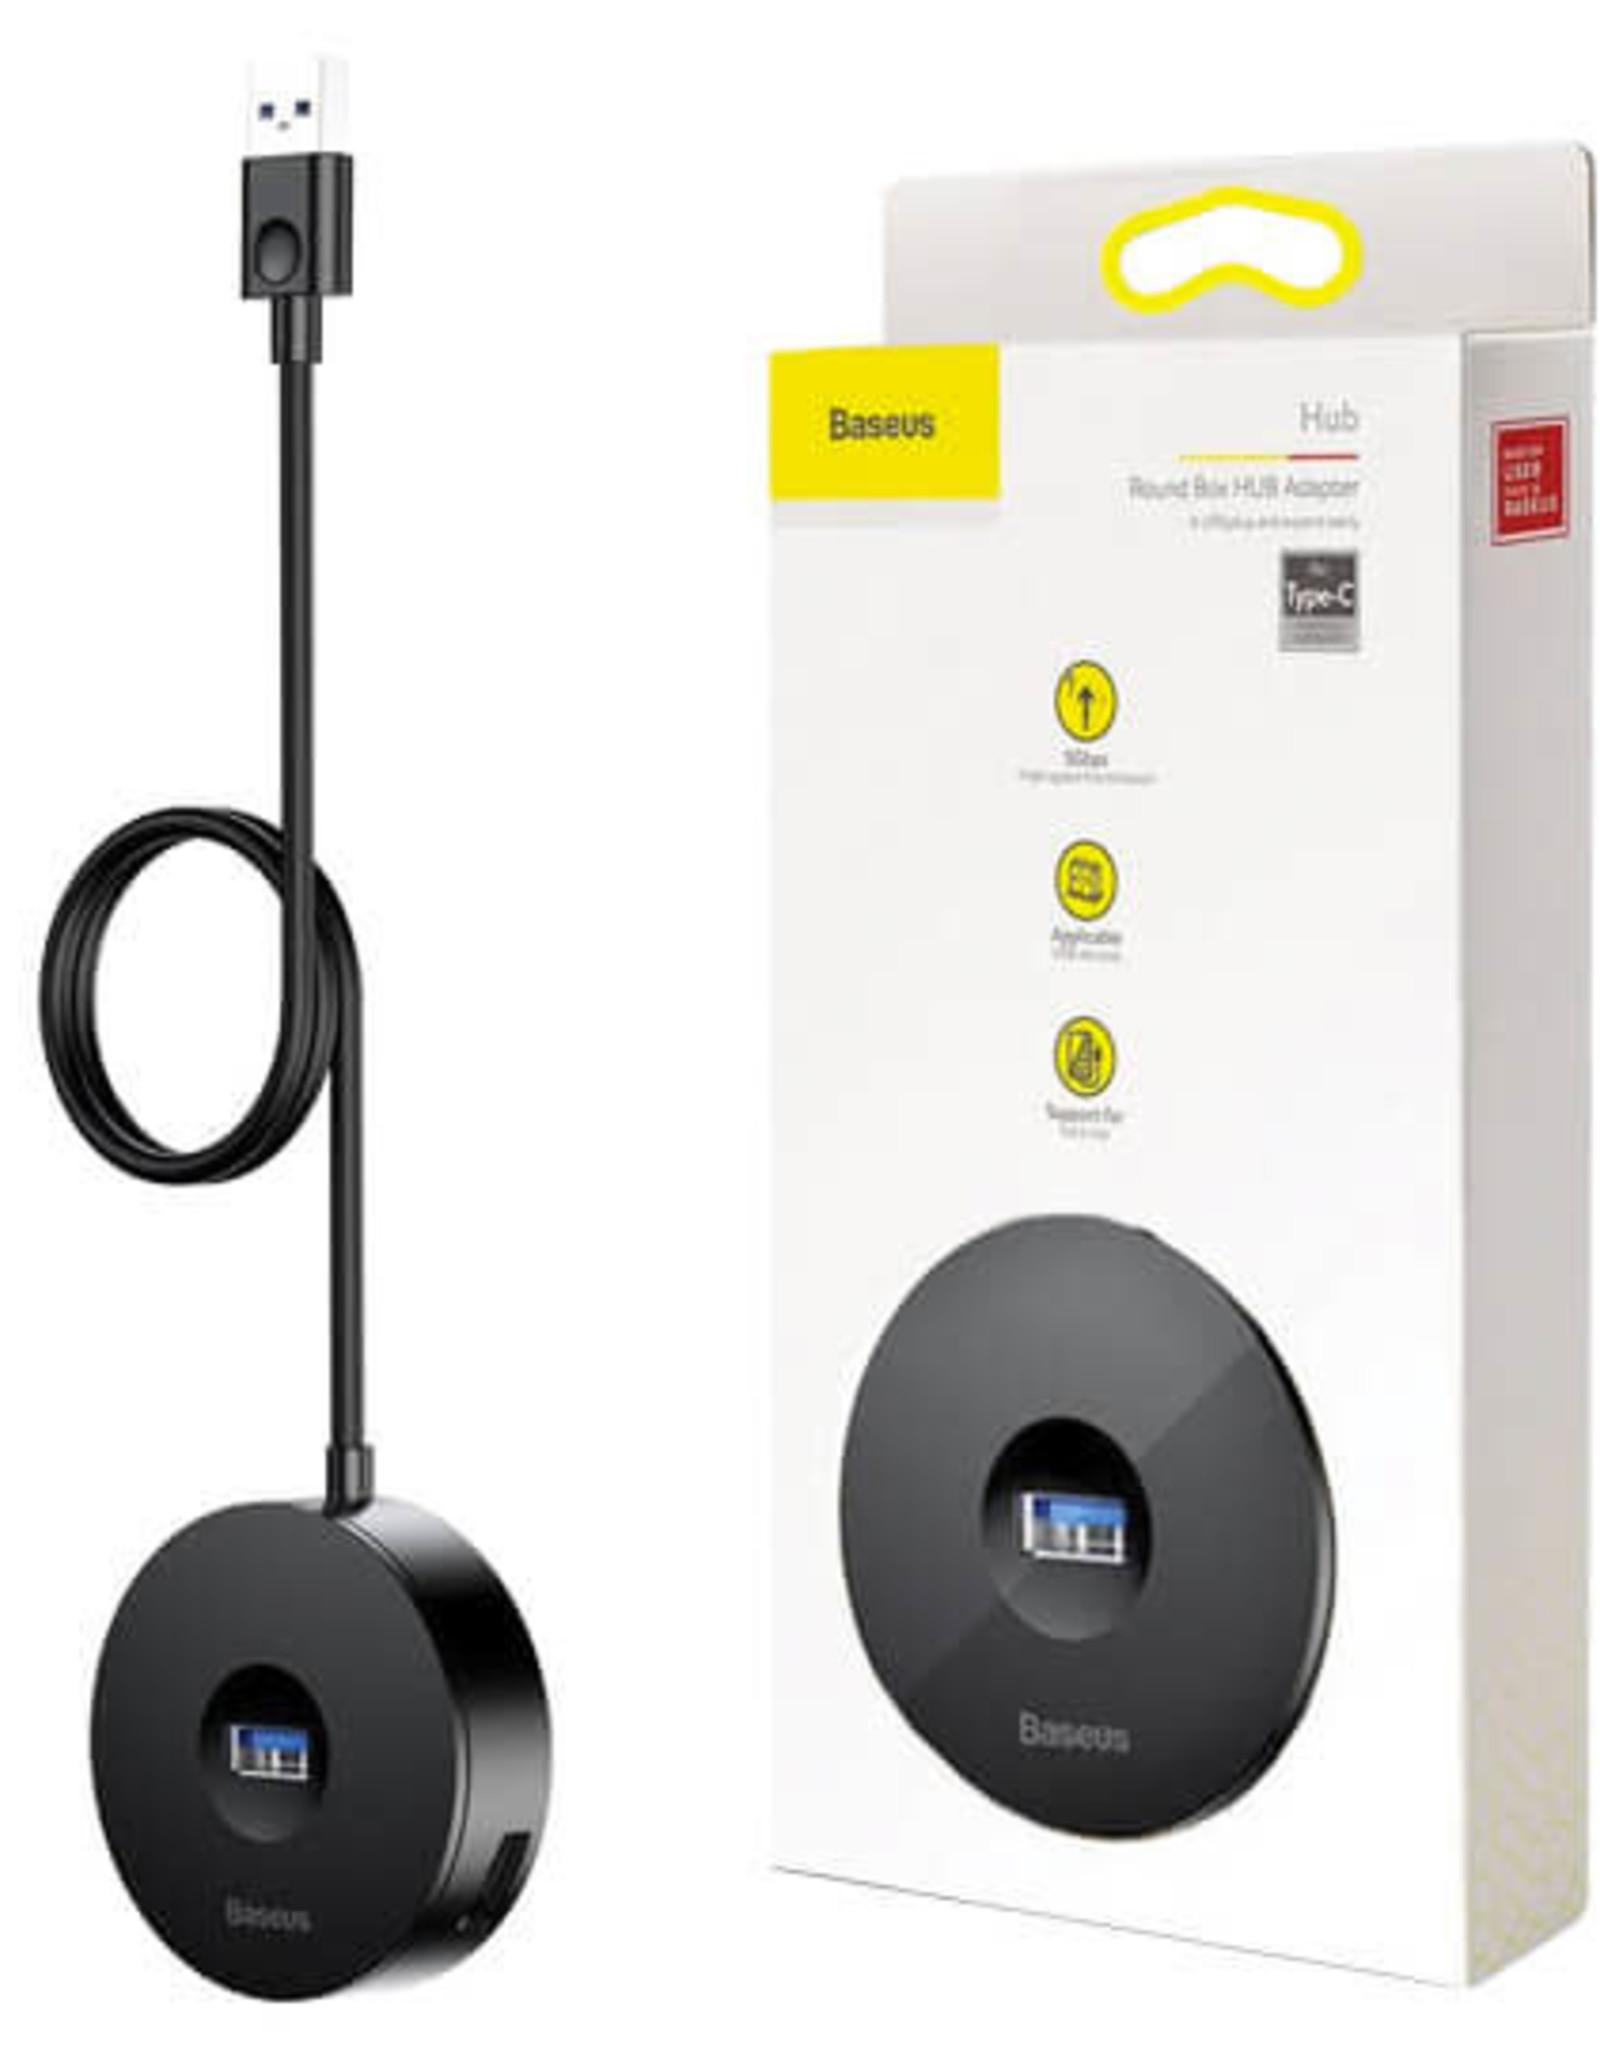 Baseus Baseus Round Box HUB Adapter for USB